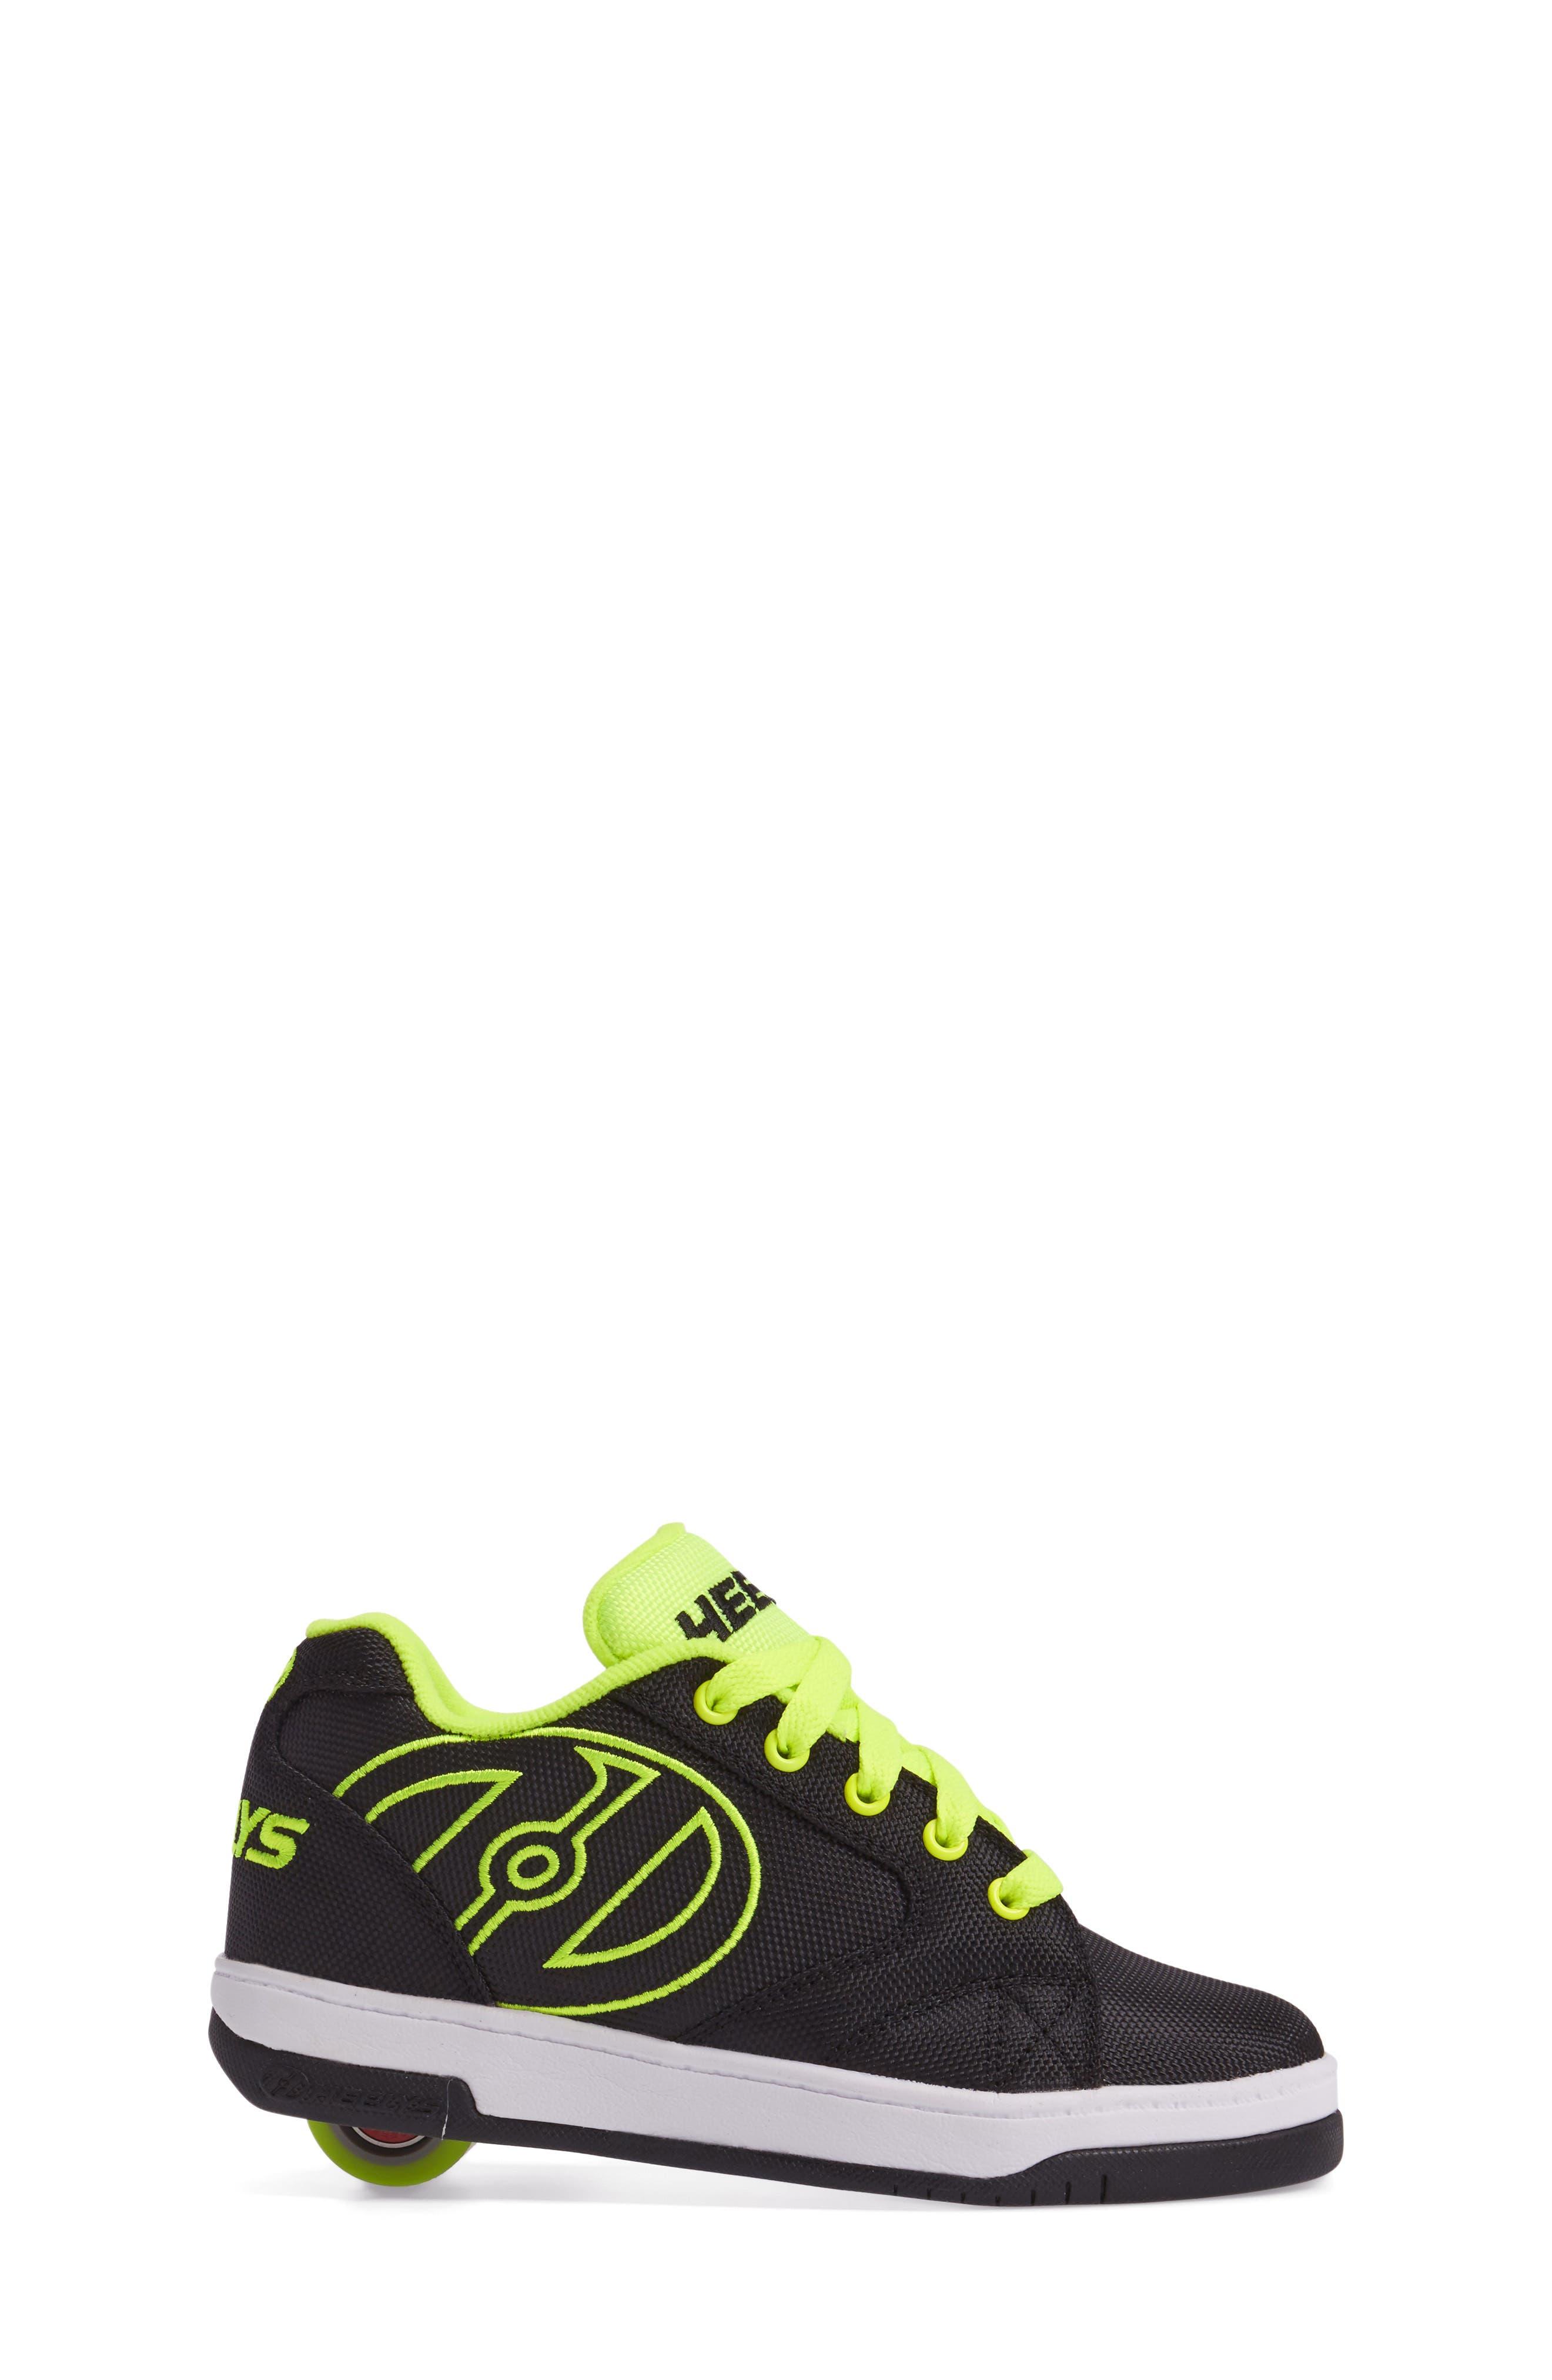 HEELYS,                             'Propel 2.0' Wheeled Sneaker,                             Alternate thumbnail 3, color,                             018